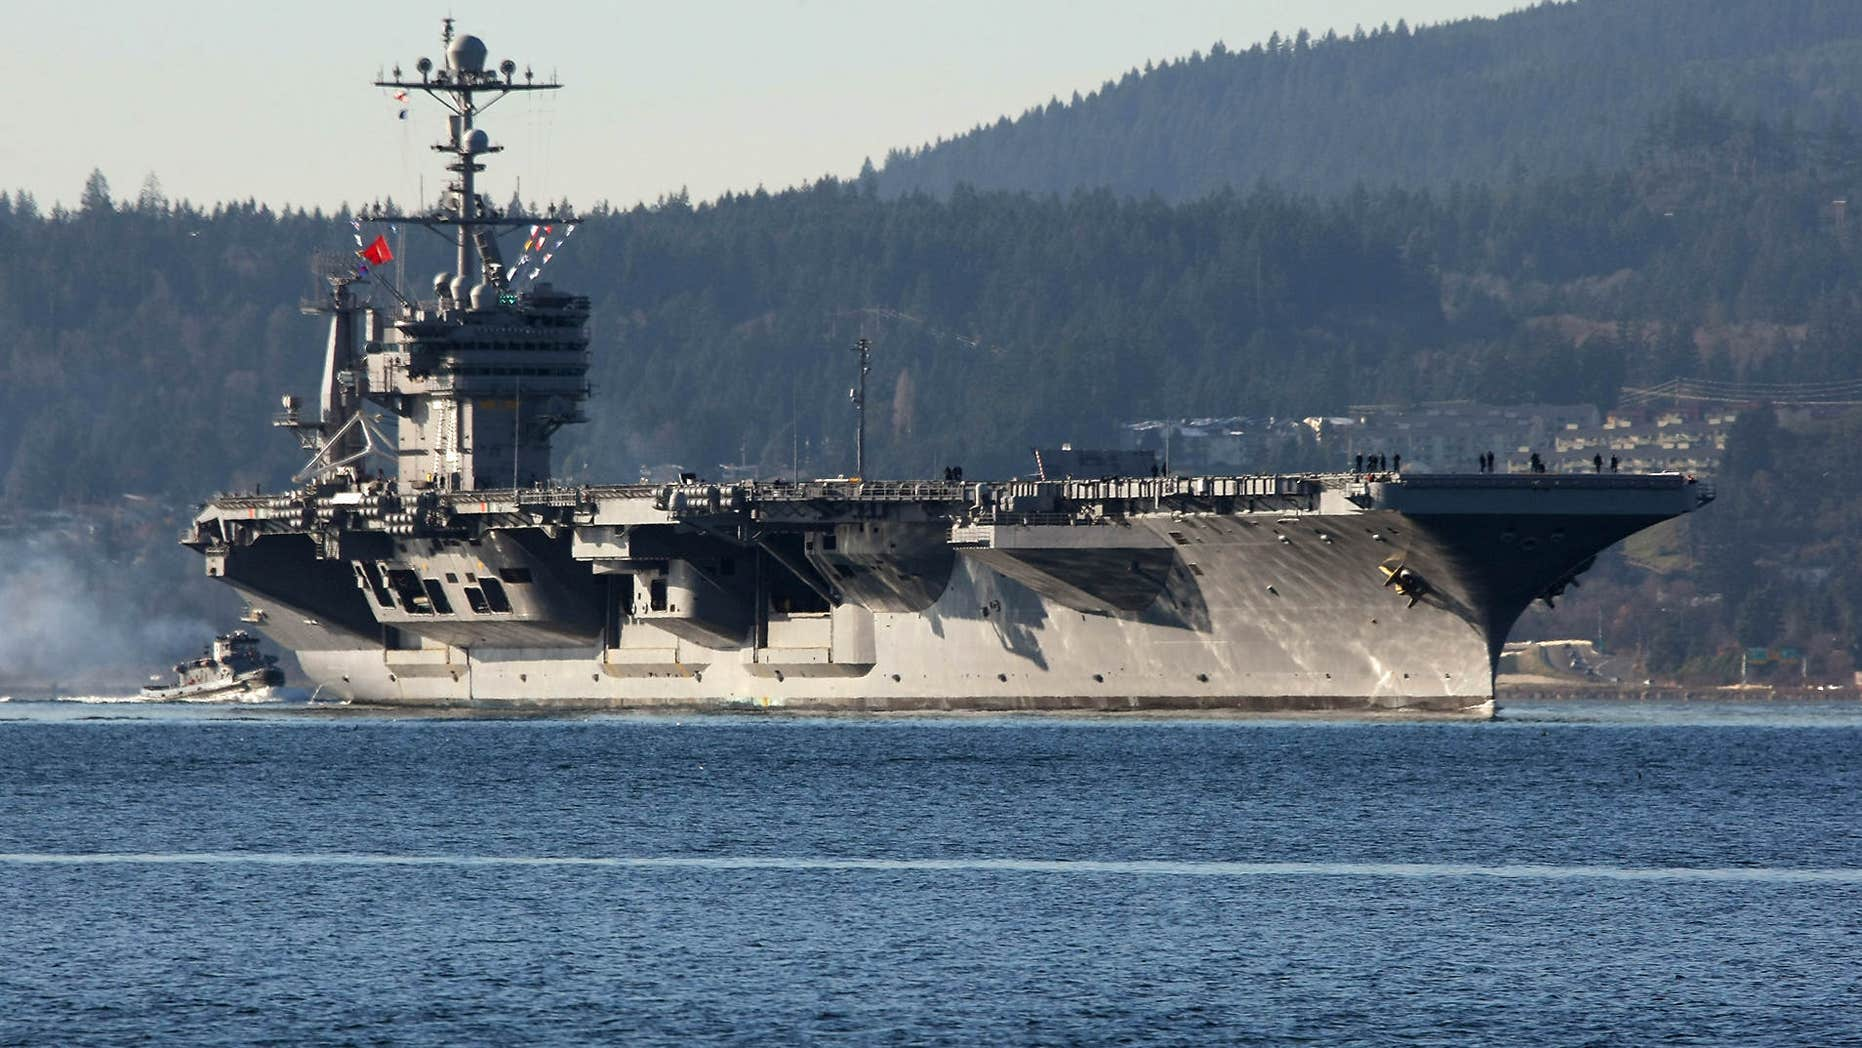 Dec. 1, 2014: FILE - In this photo Dec. 1, 2014 file photo, the aircraft carrier USS John Stennis seen near Bremerton, Wash.